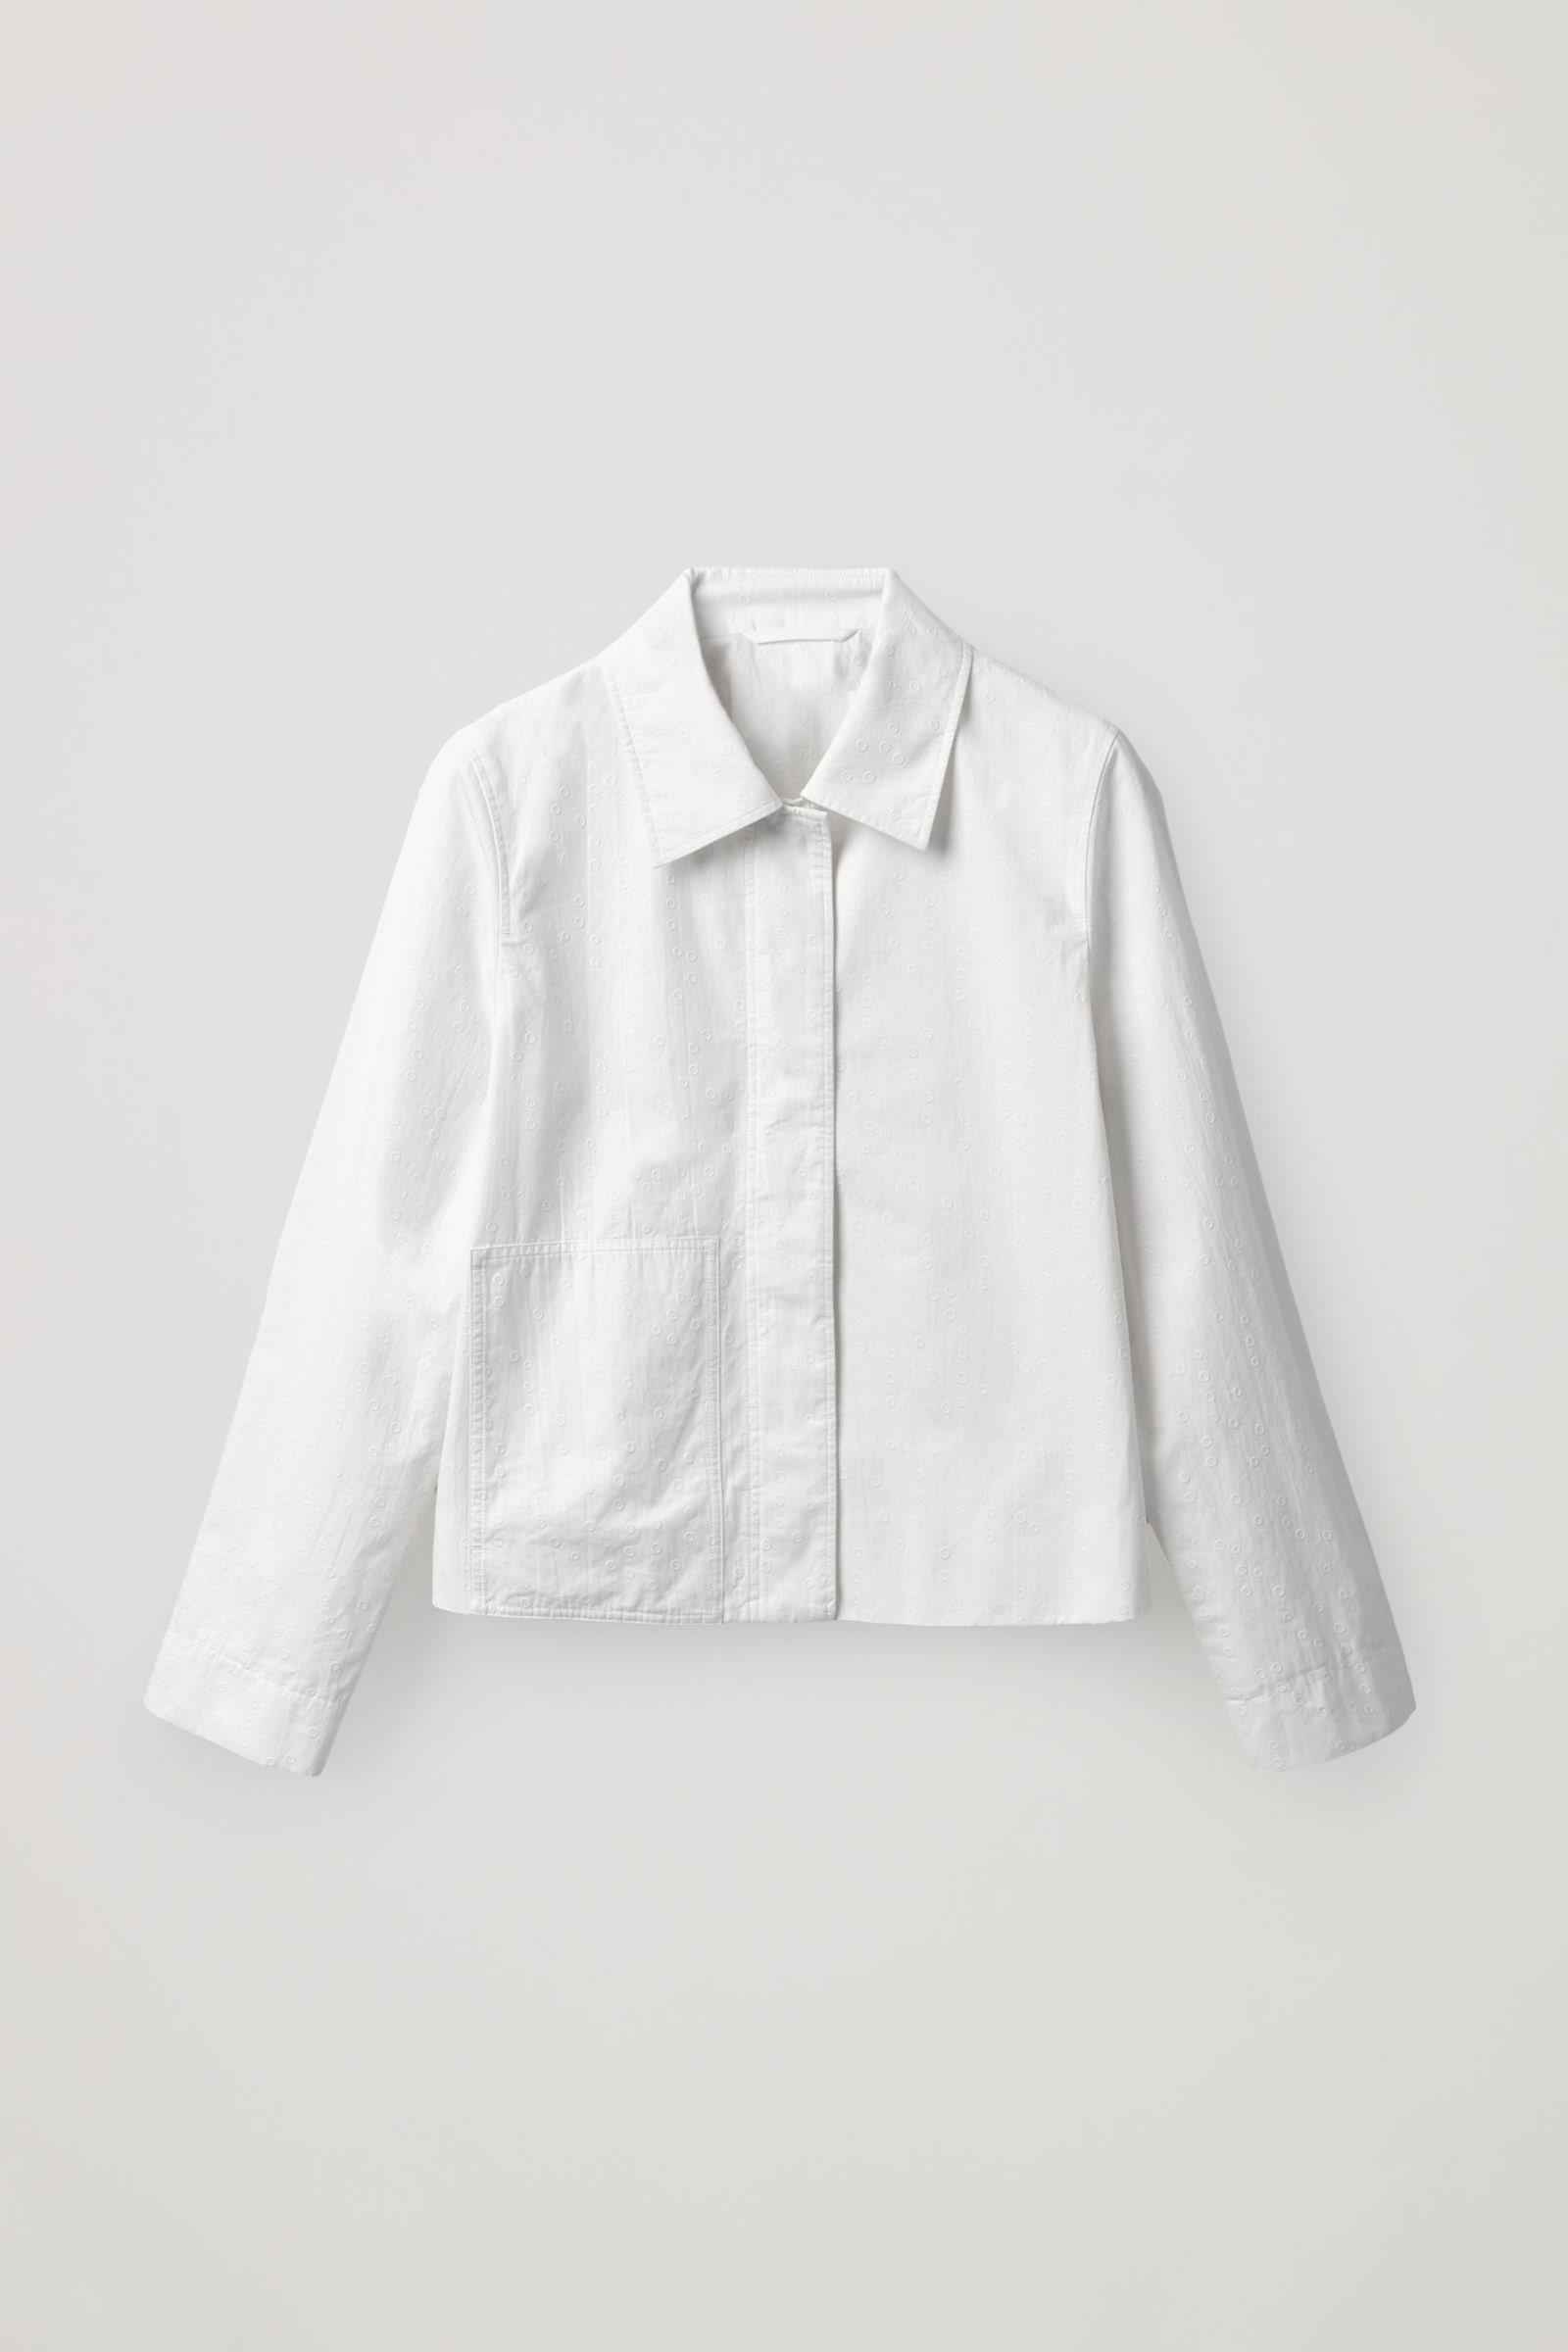 COS 크롭 코튼 재킷의 화이트컬러 Product입니다.